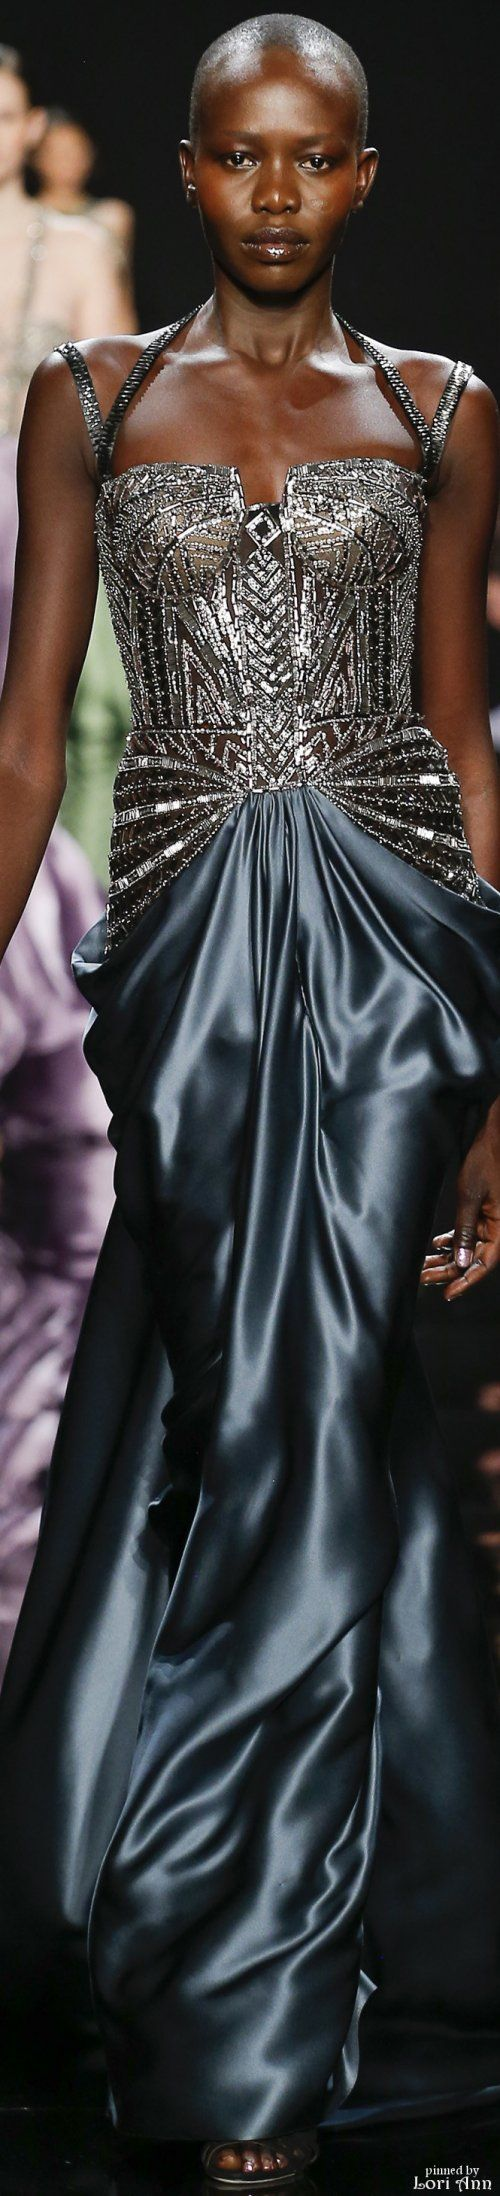 Reem Acra Fall 2016 RTW | #highfashion #inspiration #moderndesign luxury design, luxury, fashion. Visit www.memoir.pt